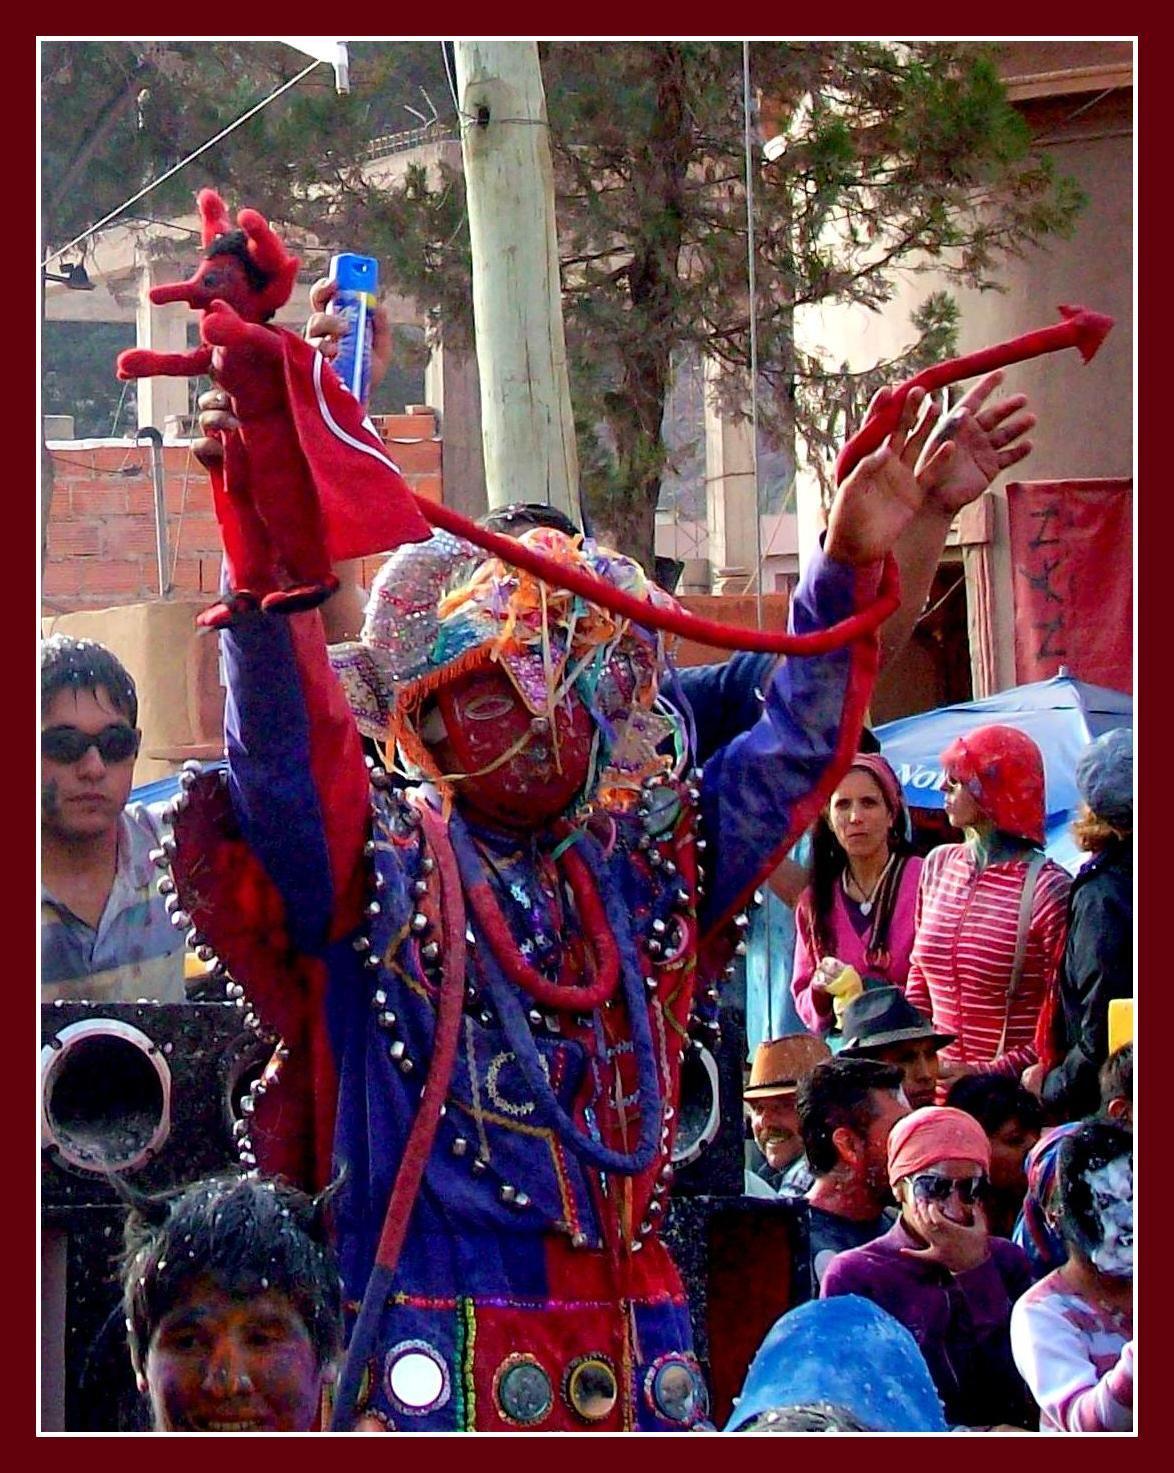 Carnaval de Tilcara - Jujuy